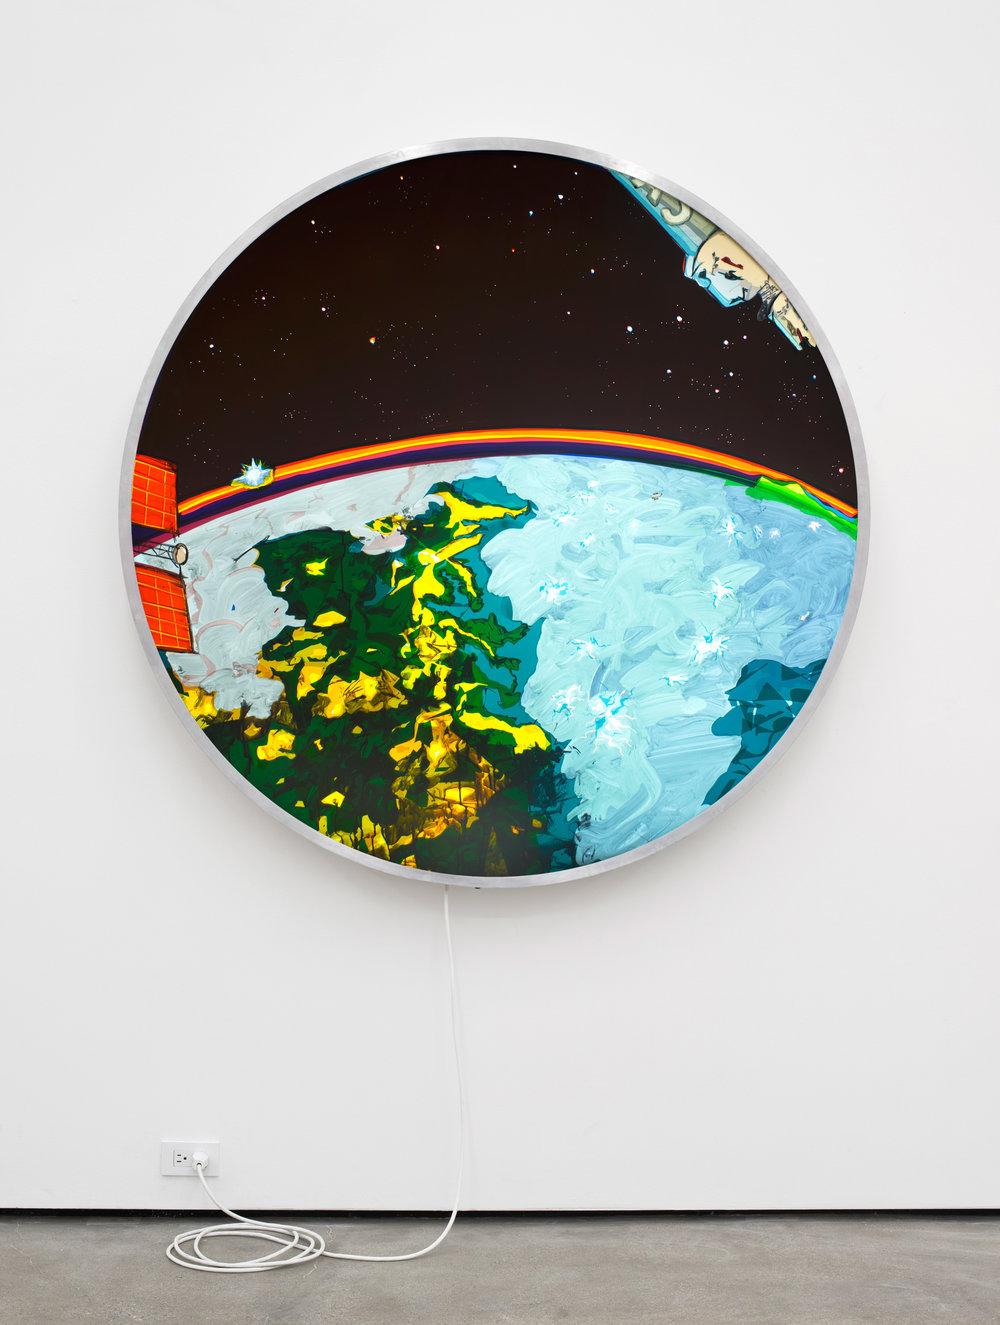 TKM_Keyhole_Satellite_USA_186_Eastern_Seaboard_BF_LG.jpg